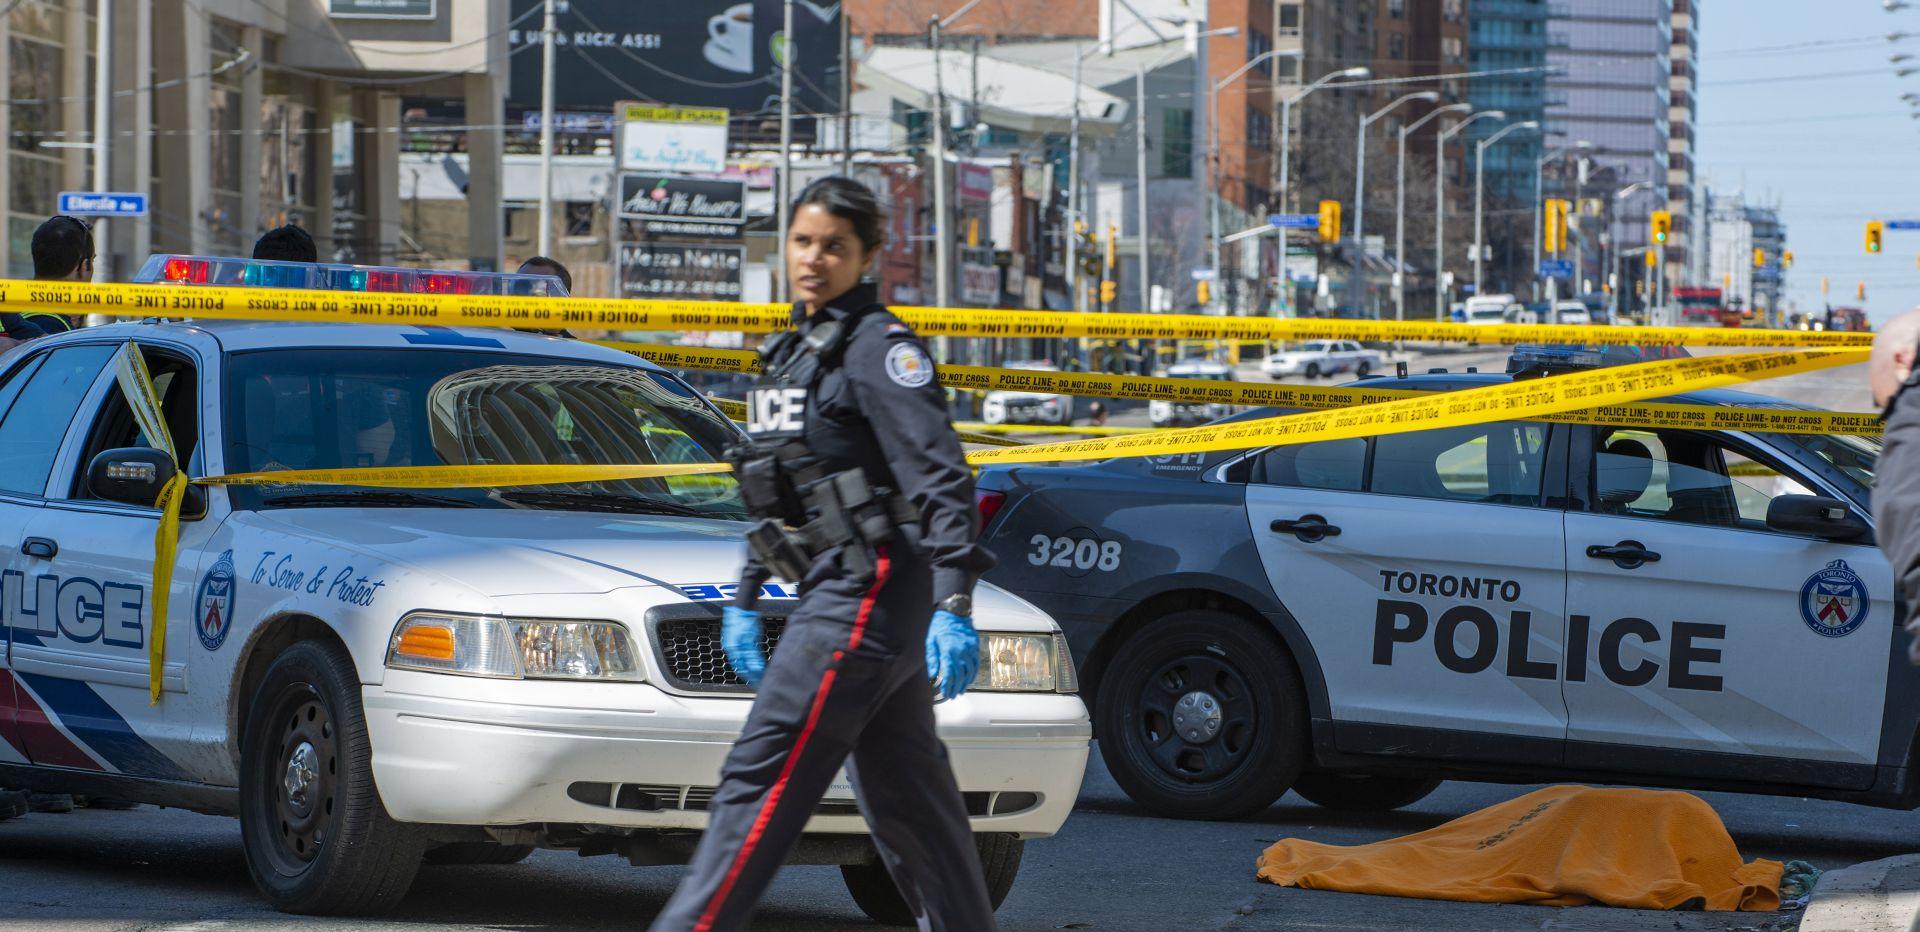 Napadač iz Toronta povučena osoba s posebnim potrebama